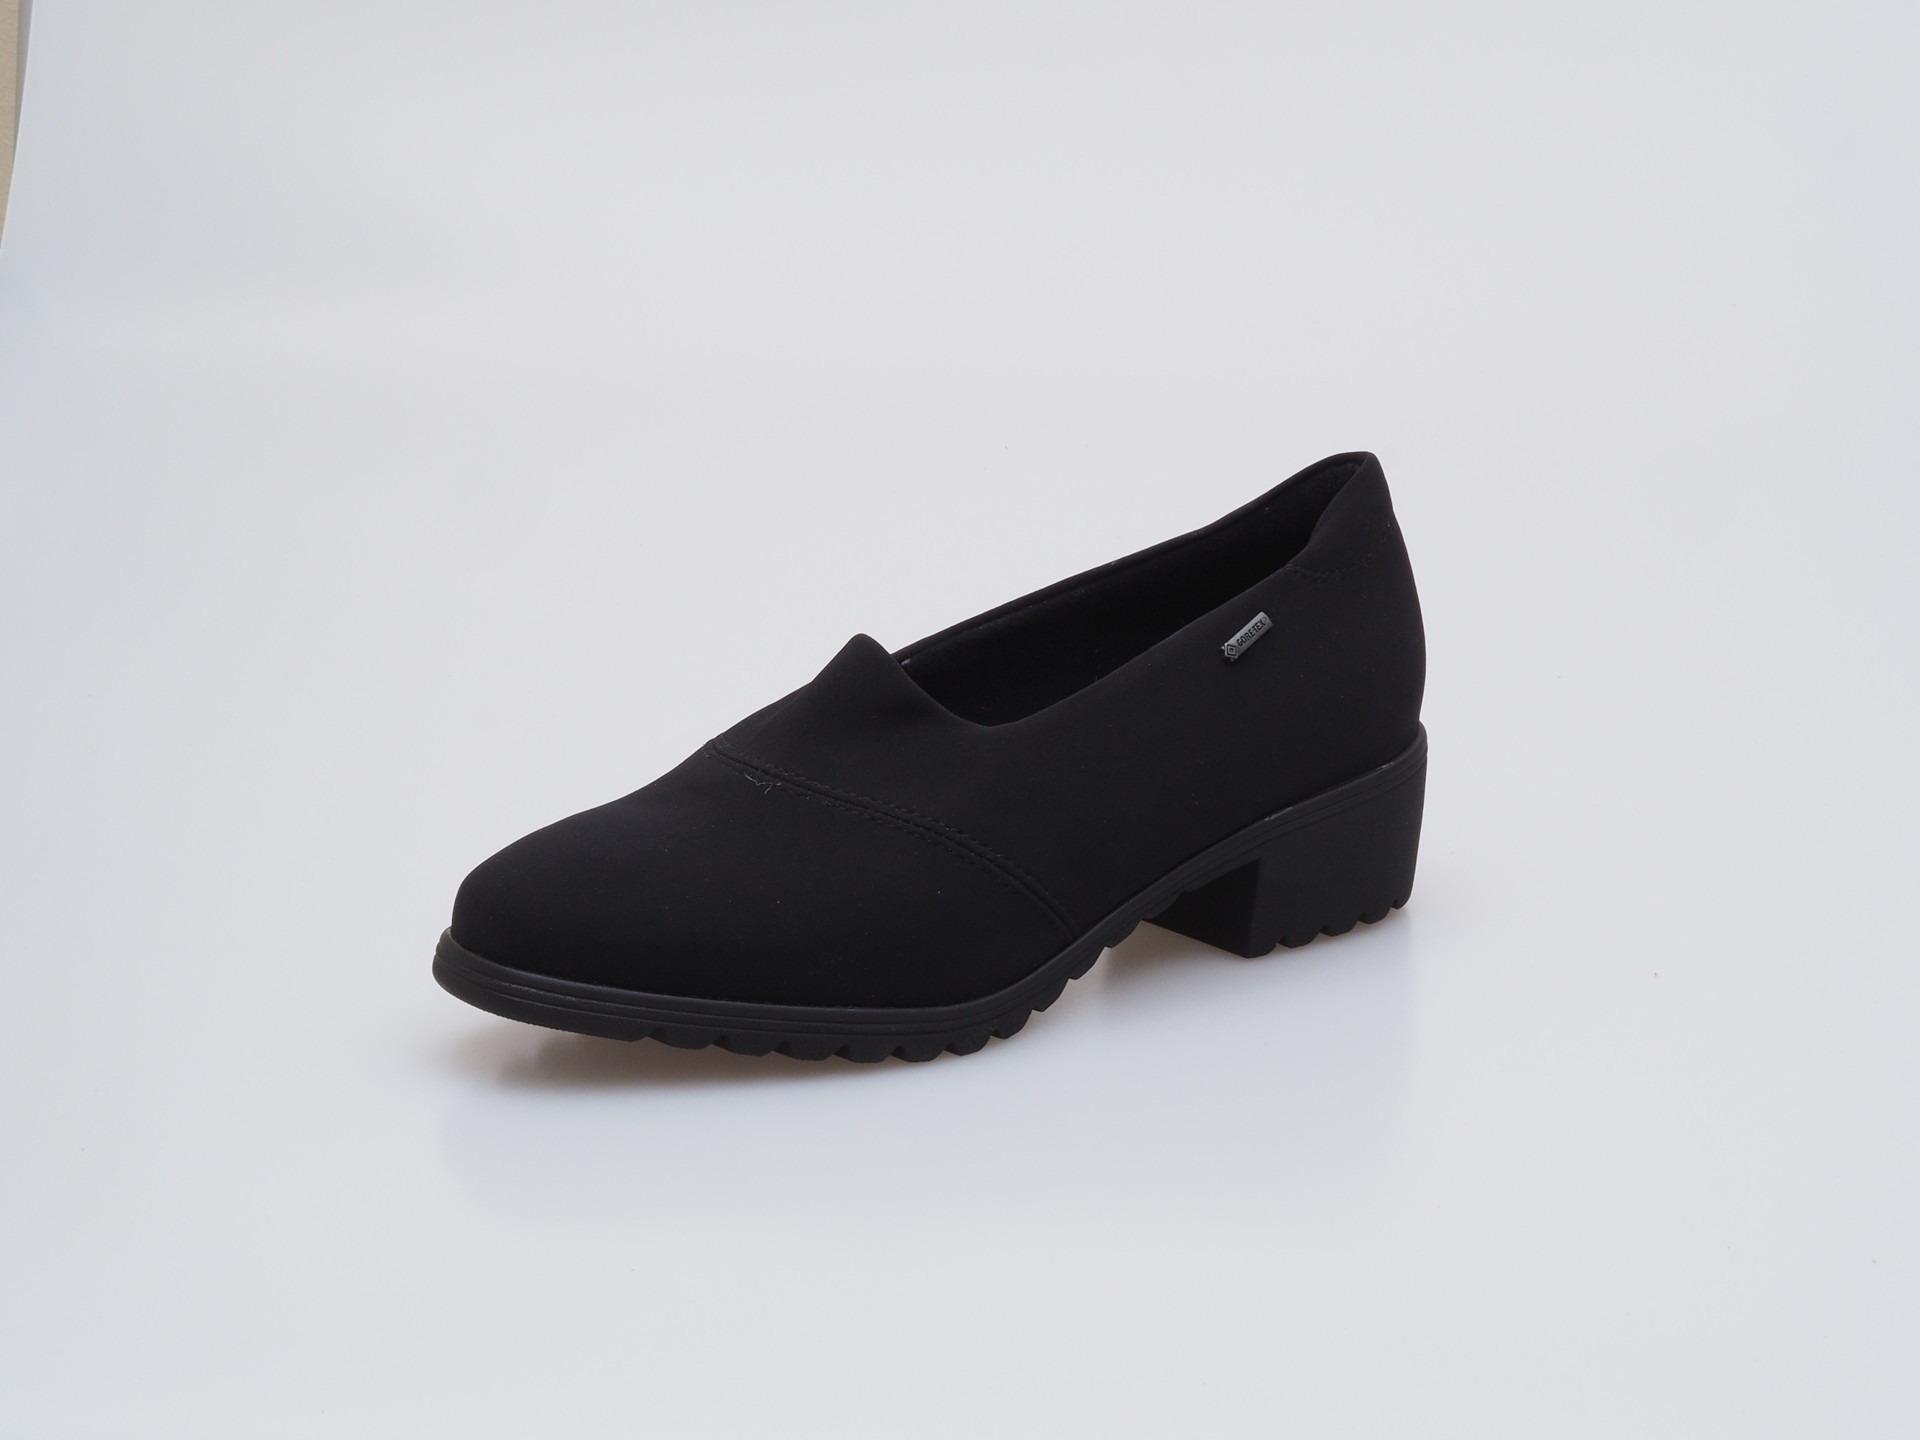 3dd44352ed73 ARA - Poltopánky - Gore- texová dámska členková obuv značky Ara